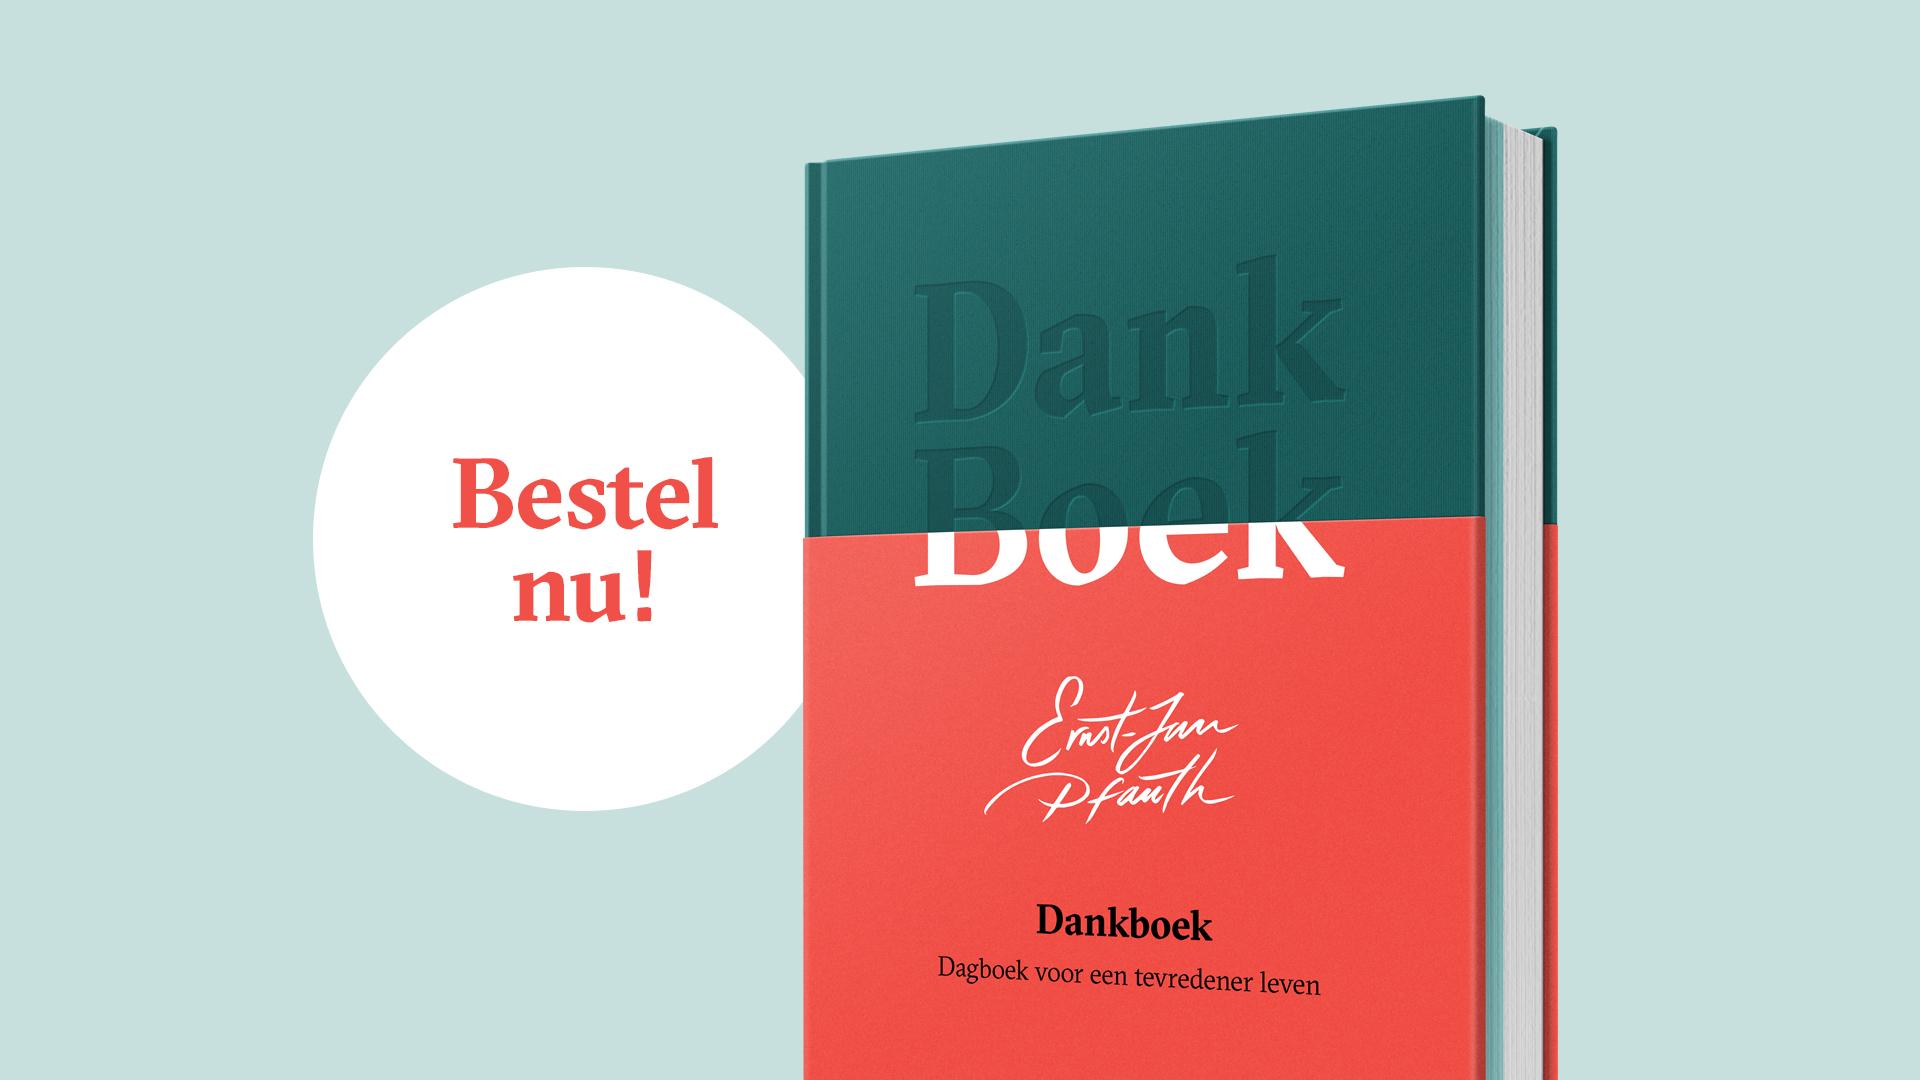 dankboek_bestelnu_banner_02.jpg